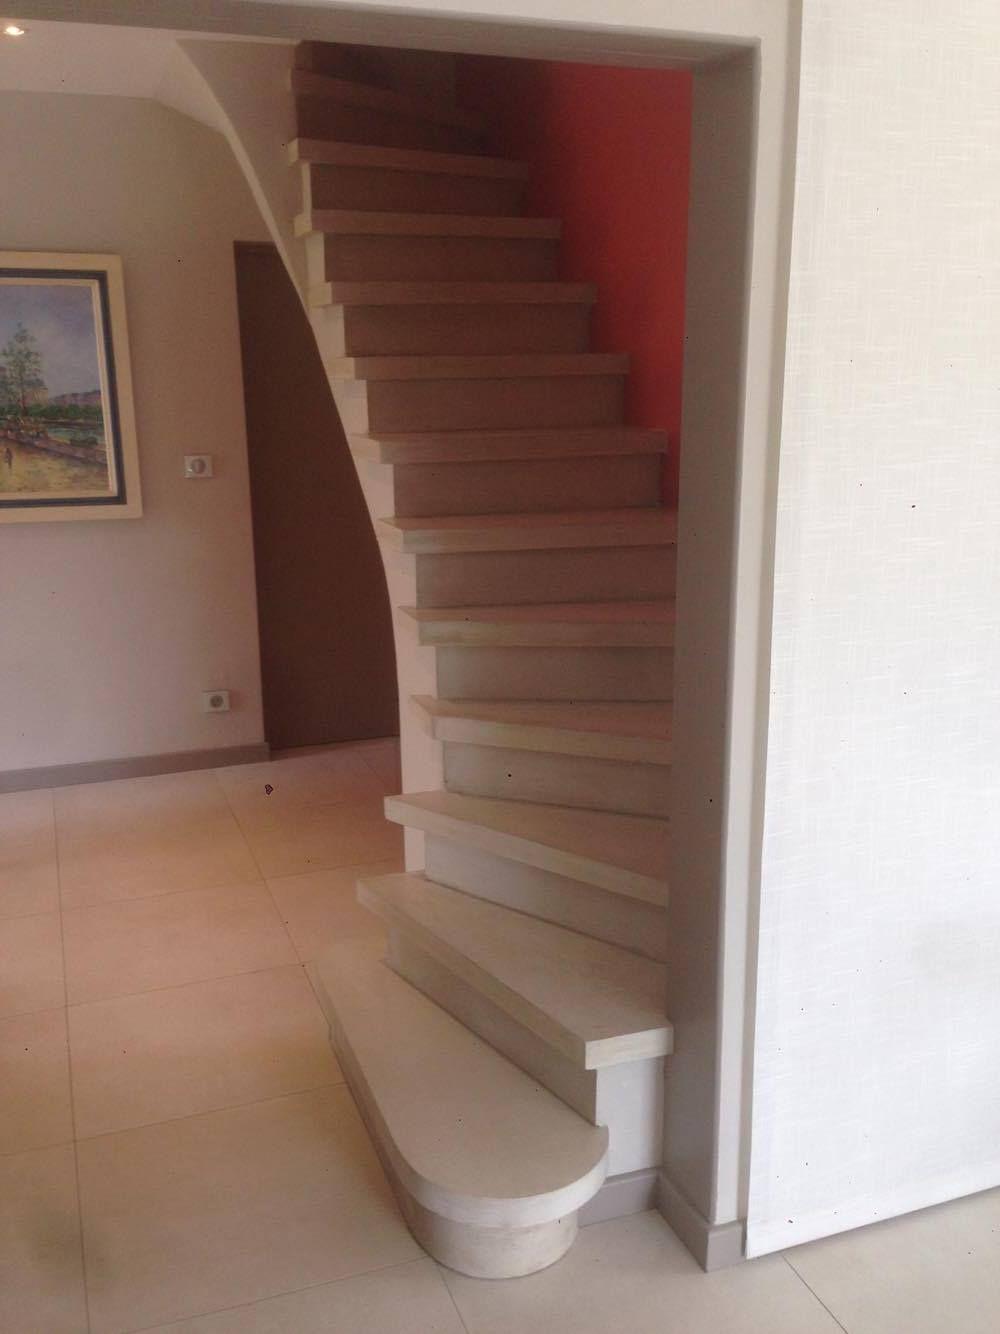 Fabrication Et Pose D Escalier En Beton Teinte A Carcassonne Et Toulouse Escalier Beton Escalier Beton Teinte